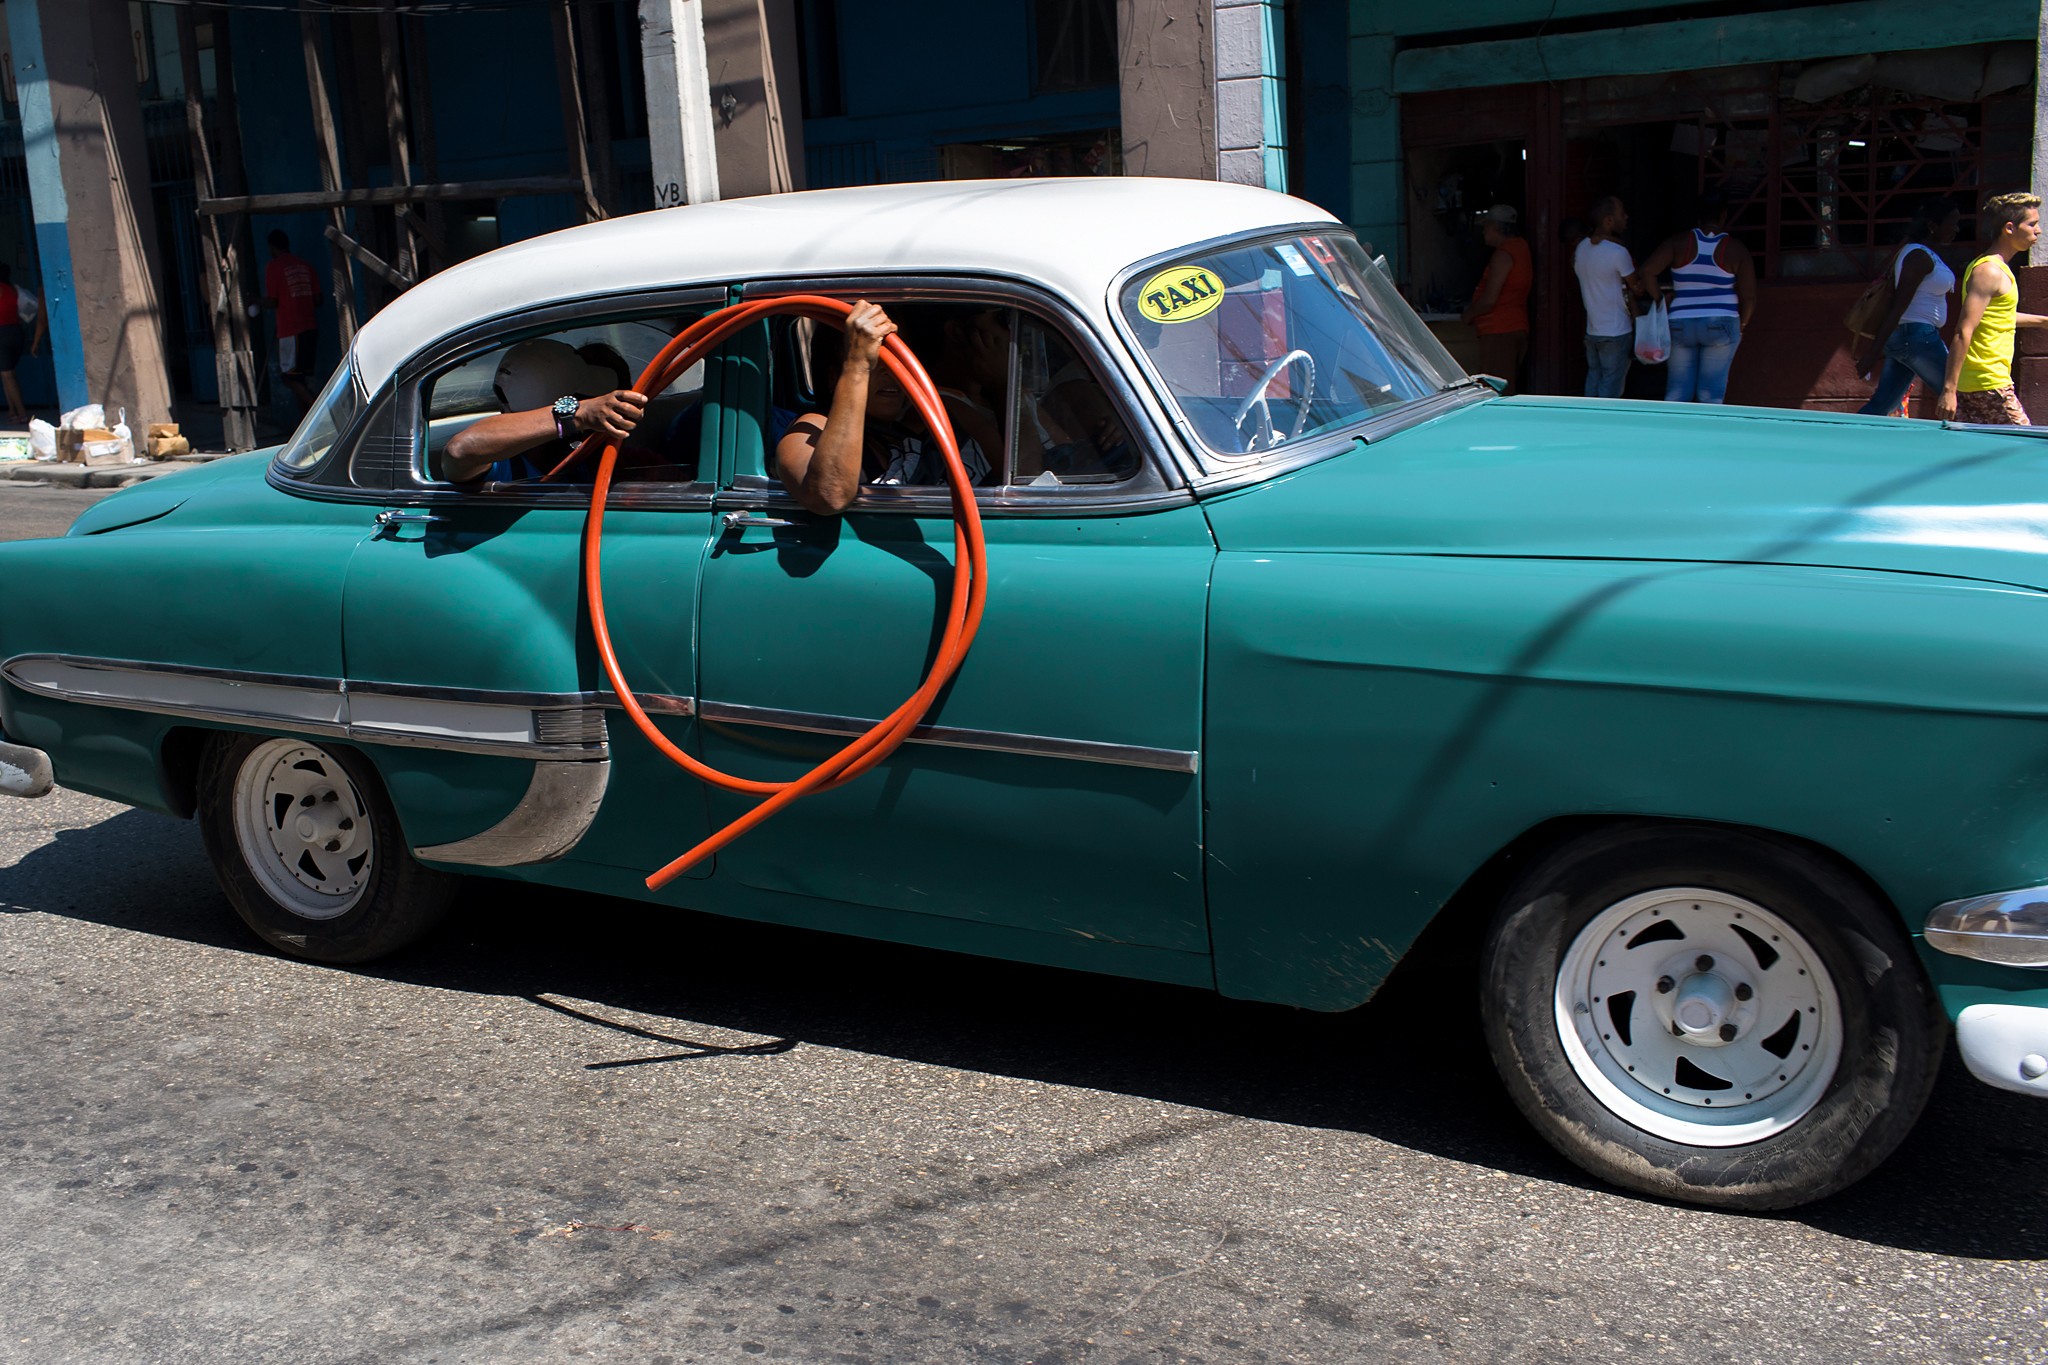 fb.cc.TIGHTCROP.3.28.2017.Vintage Car w Orange Tubing Tube Havana Cuba_K9A5645.jpg